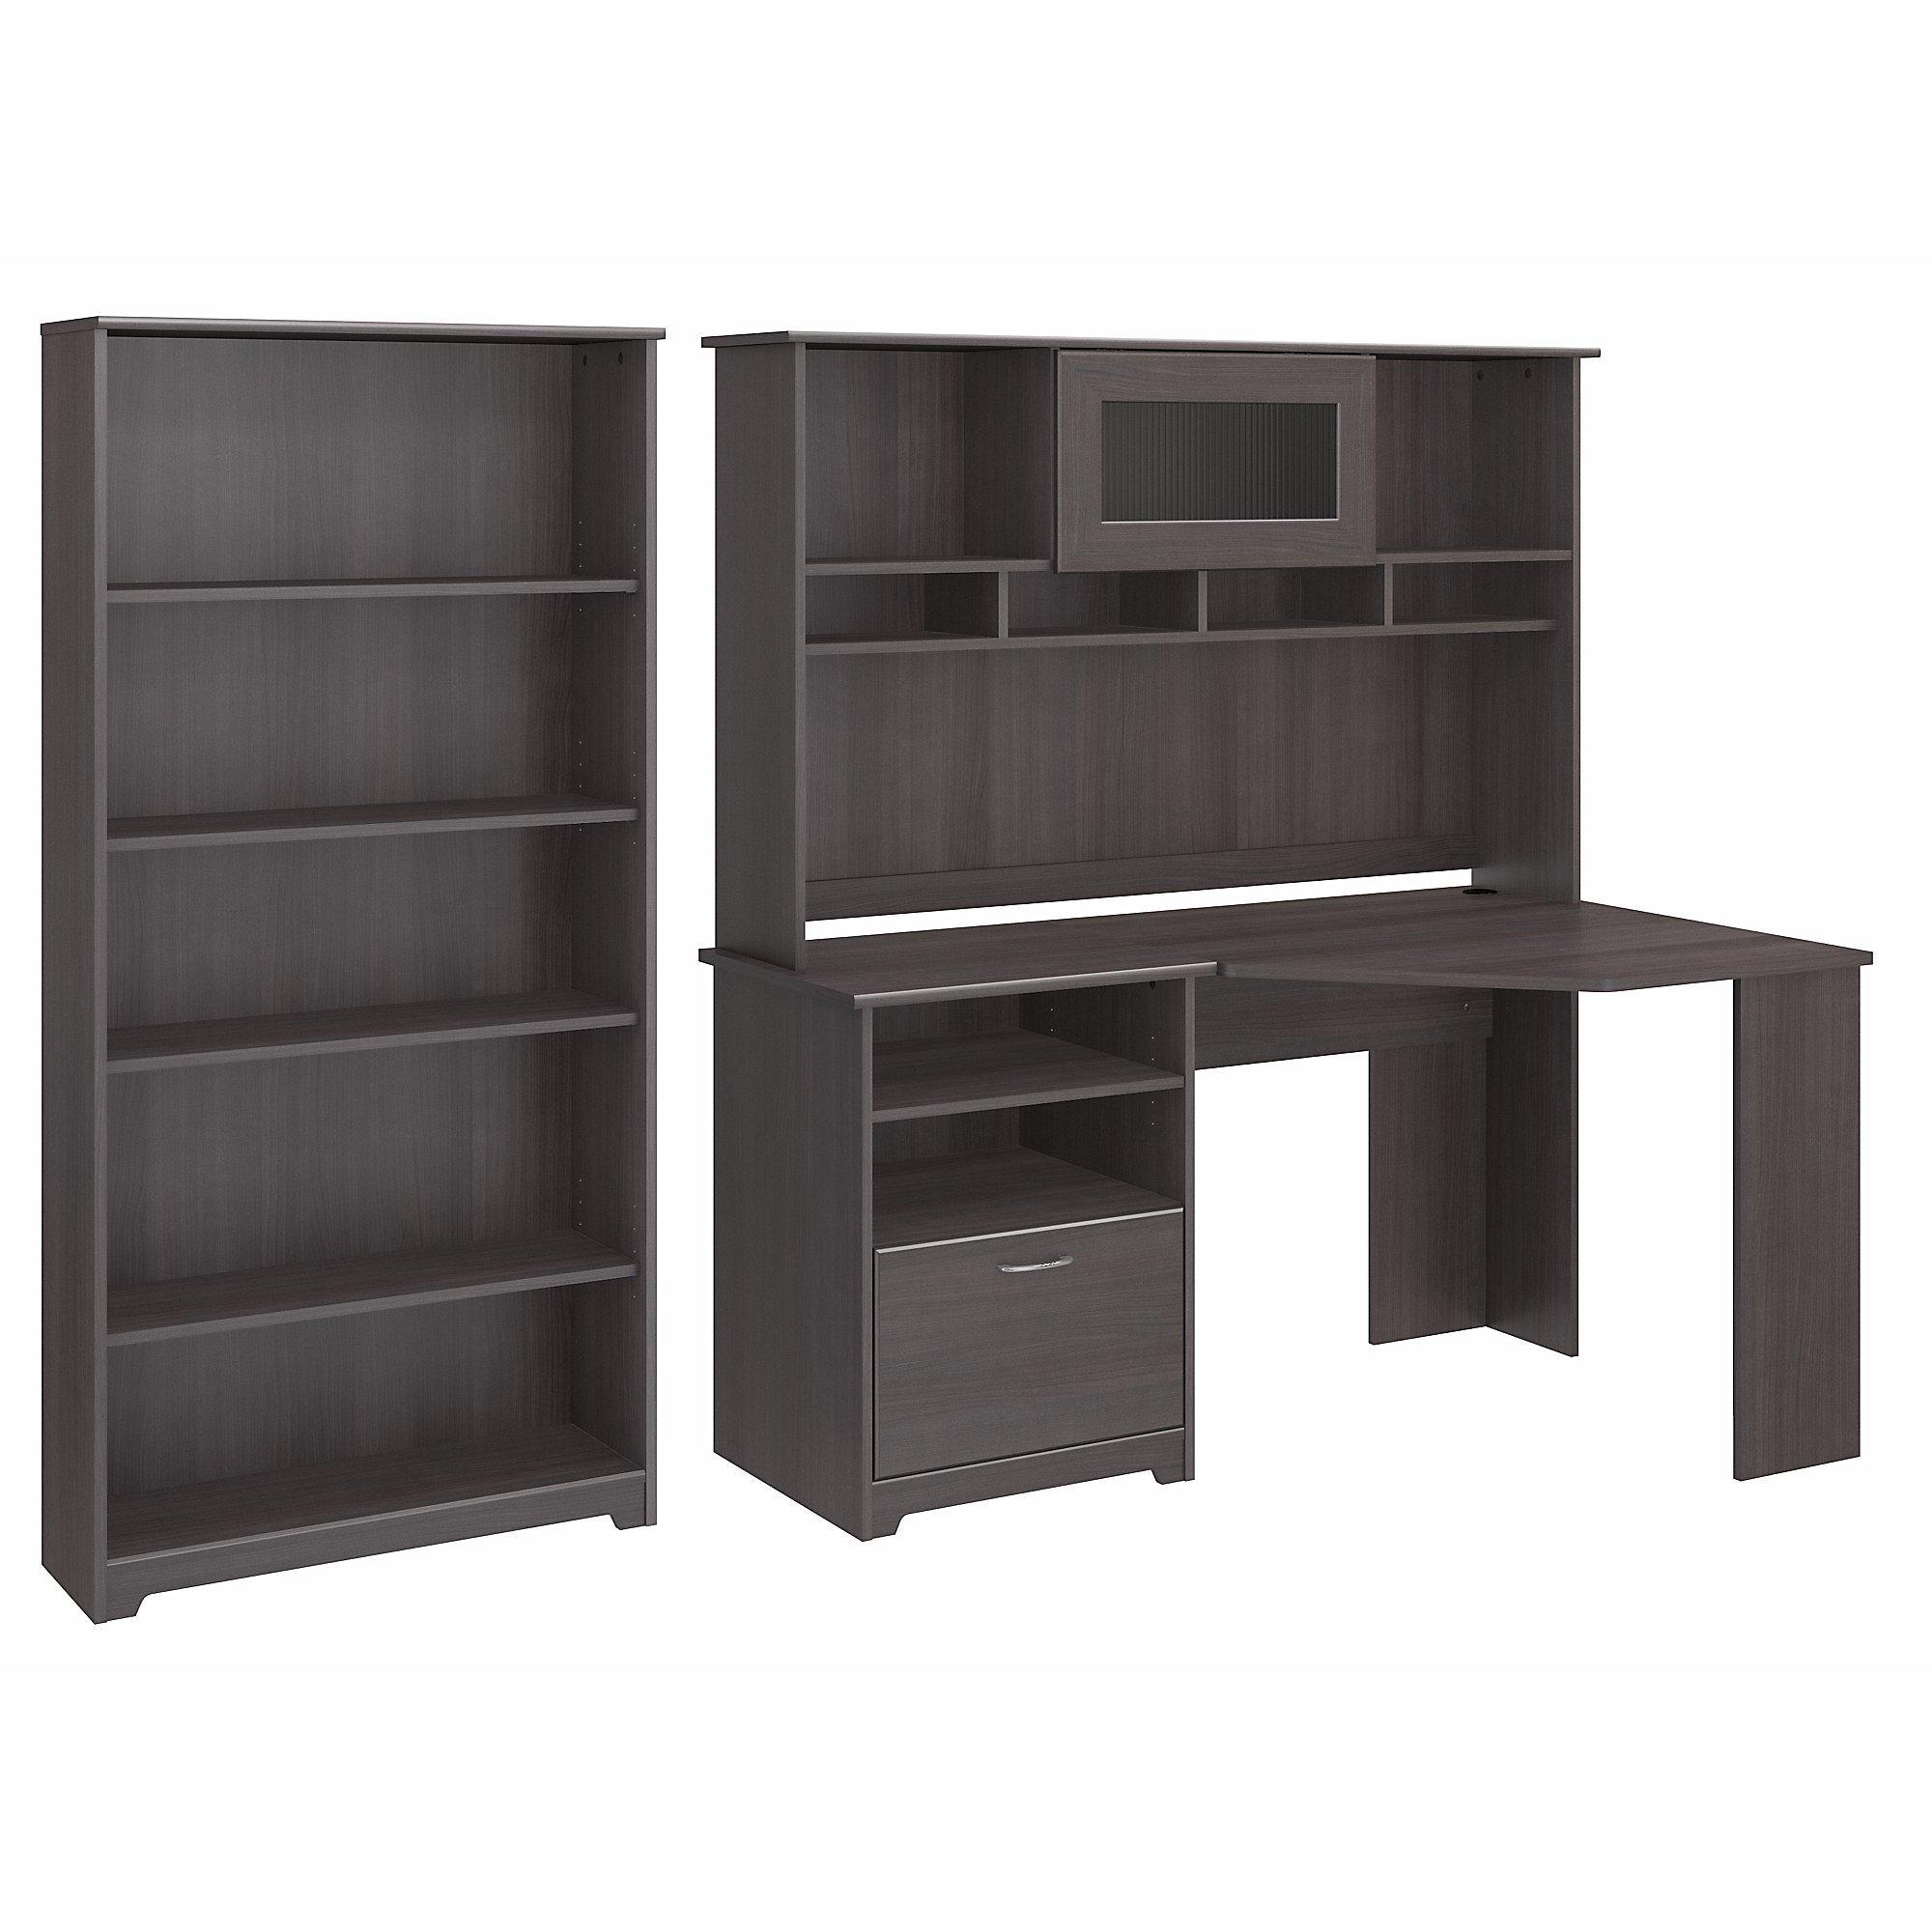 Cabot Corner Desk with Hutch and 5 Shelf Bookcase